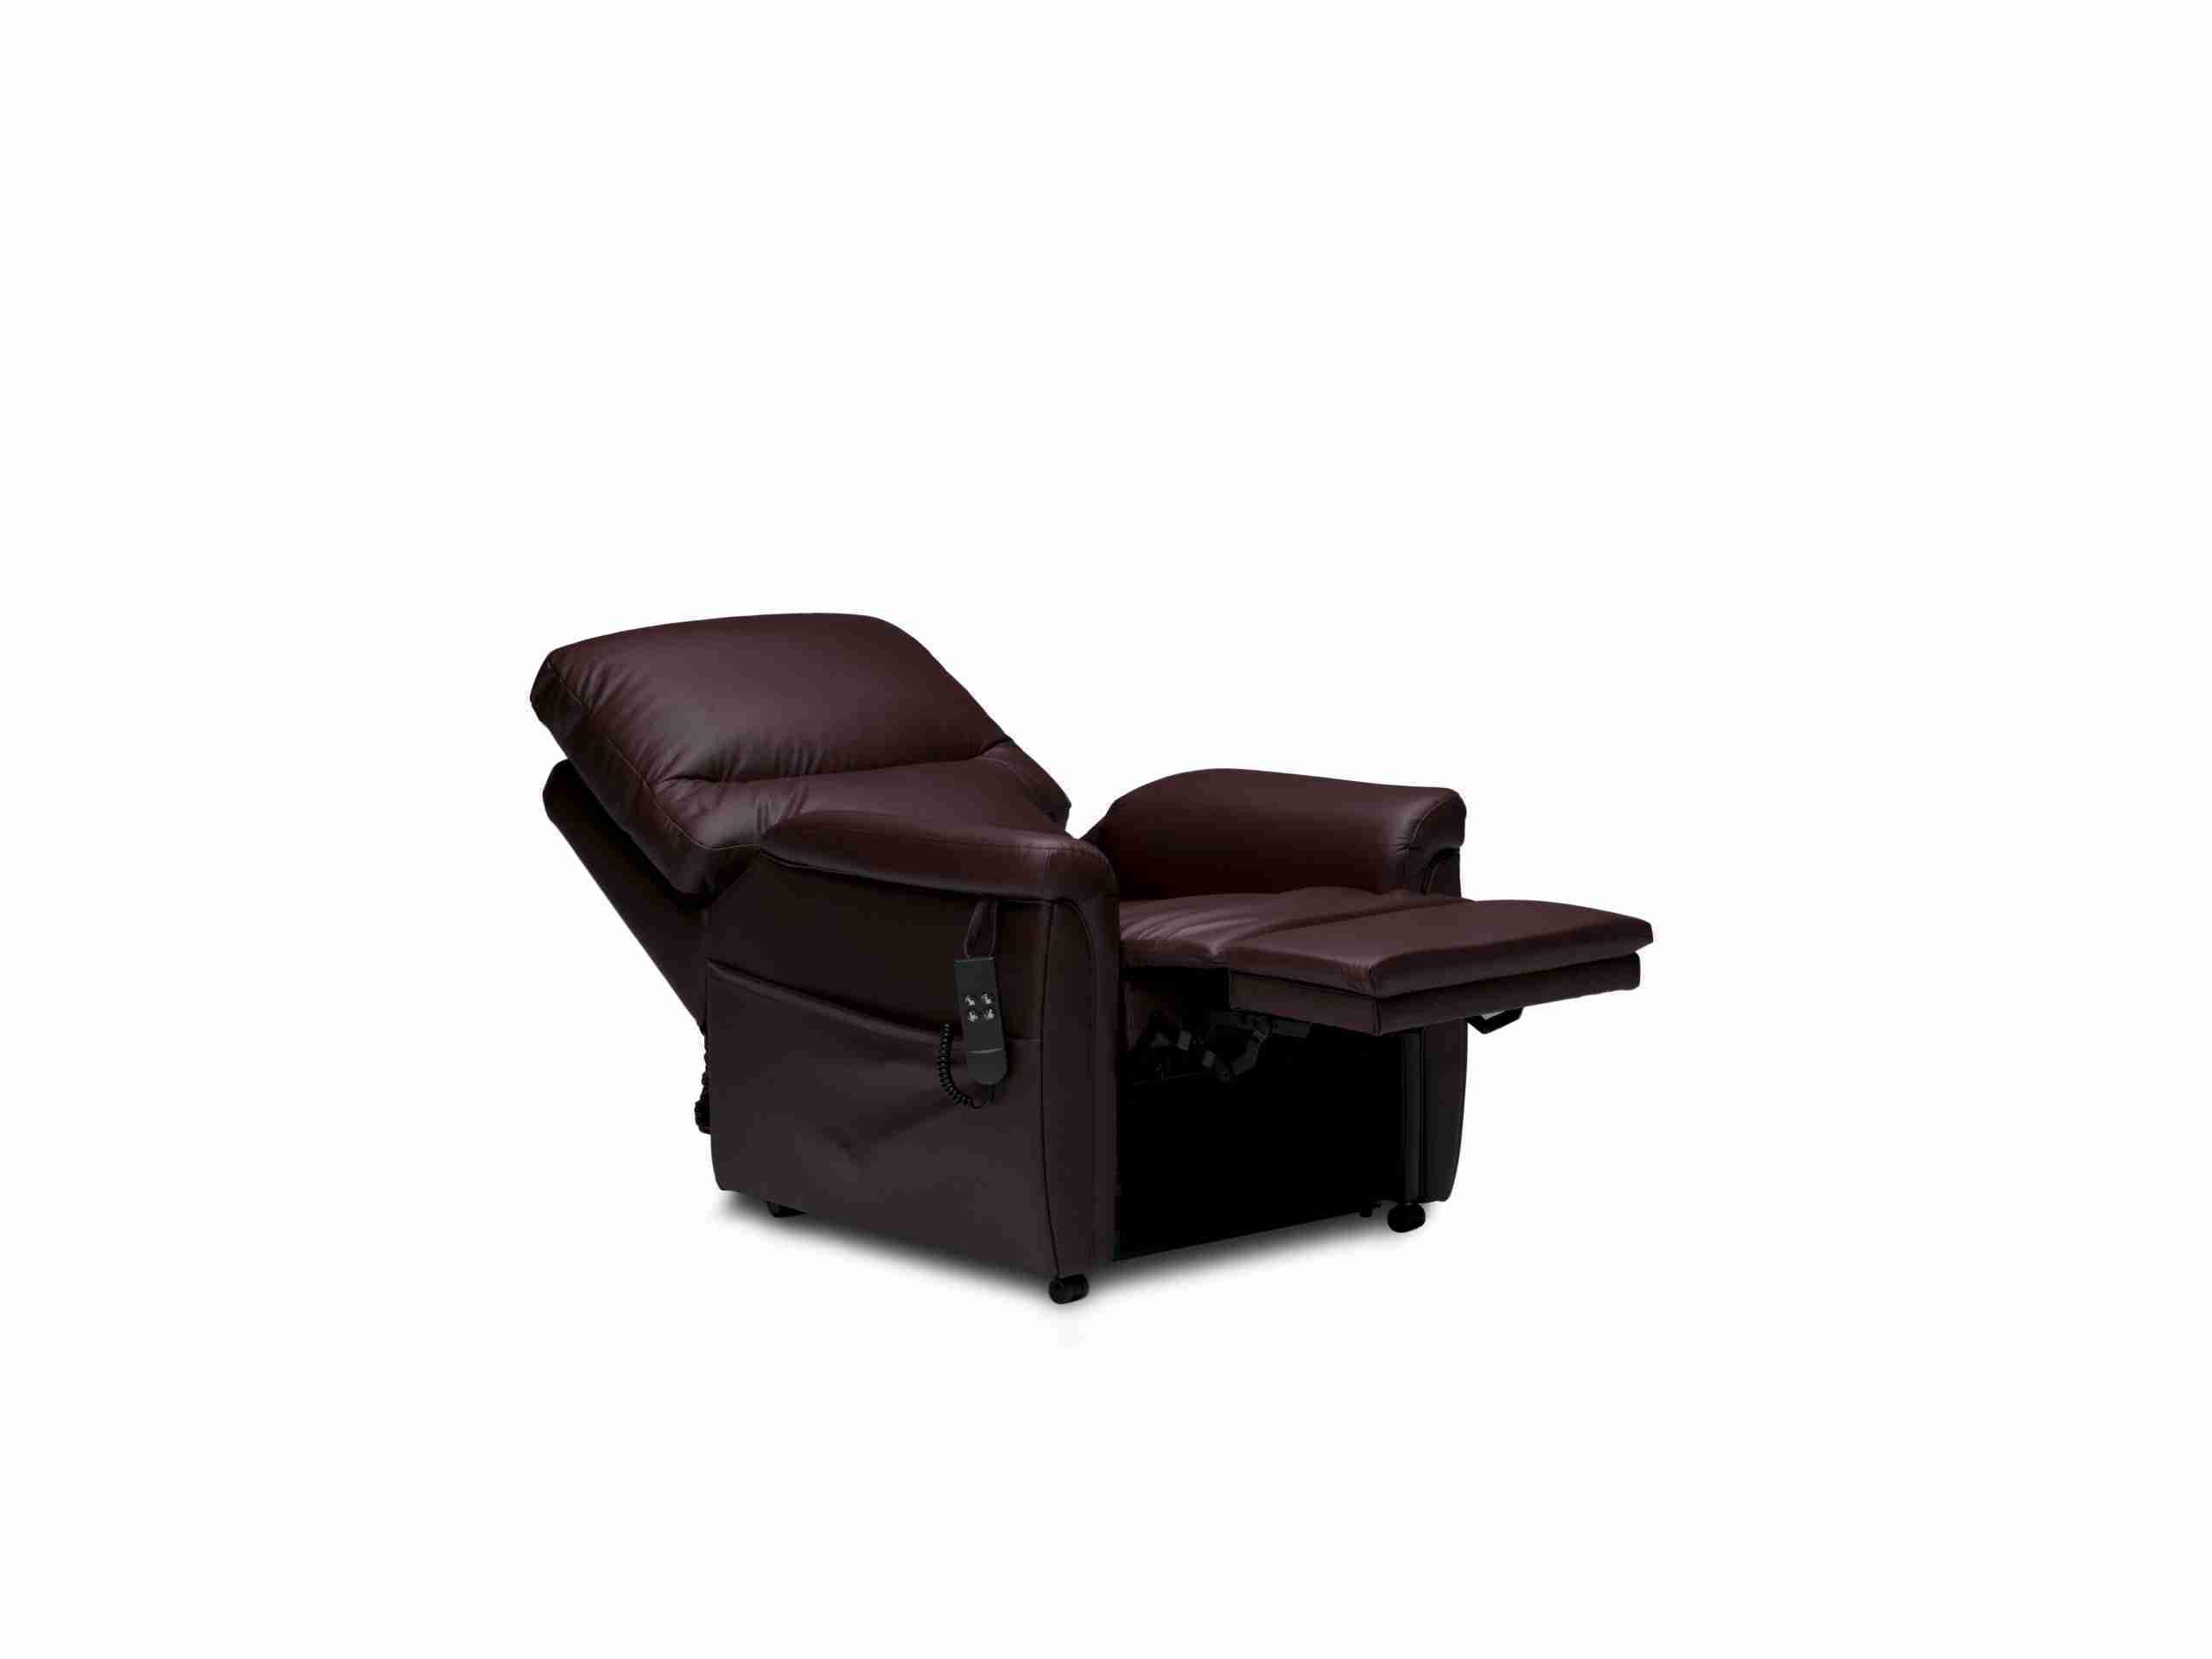 Kingston Chair Repose04